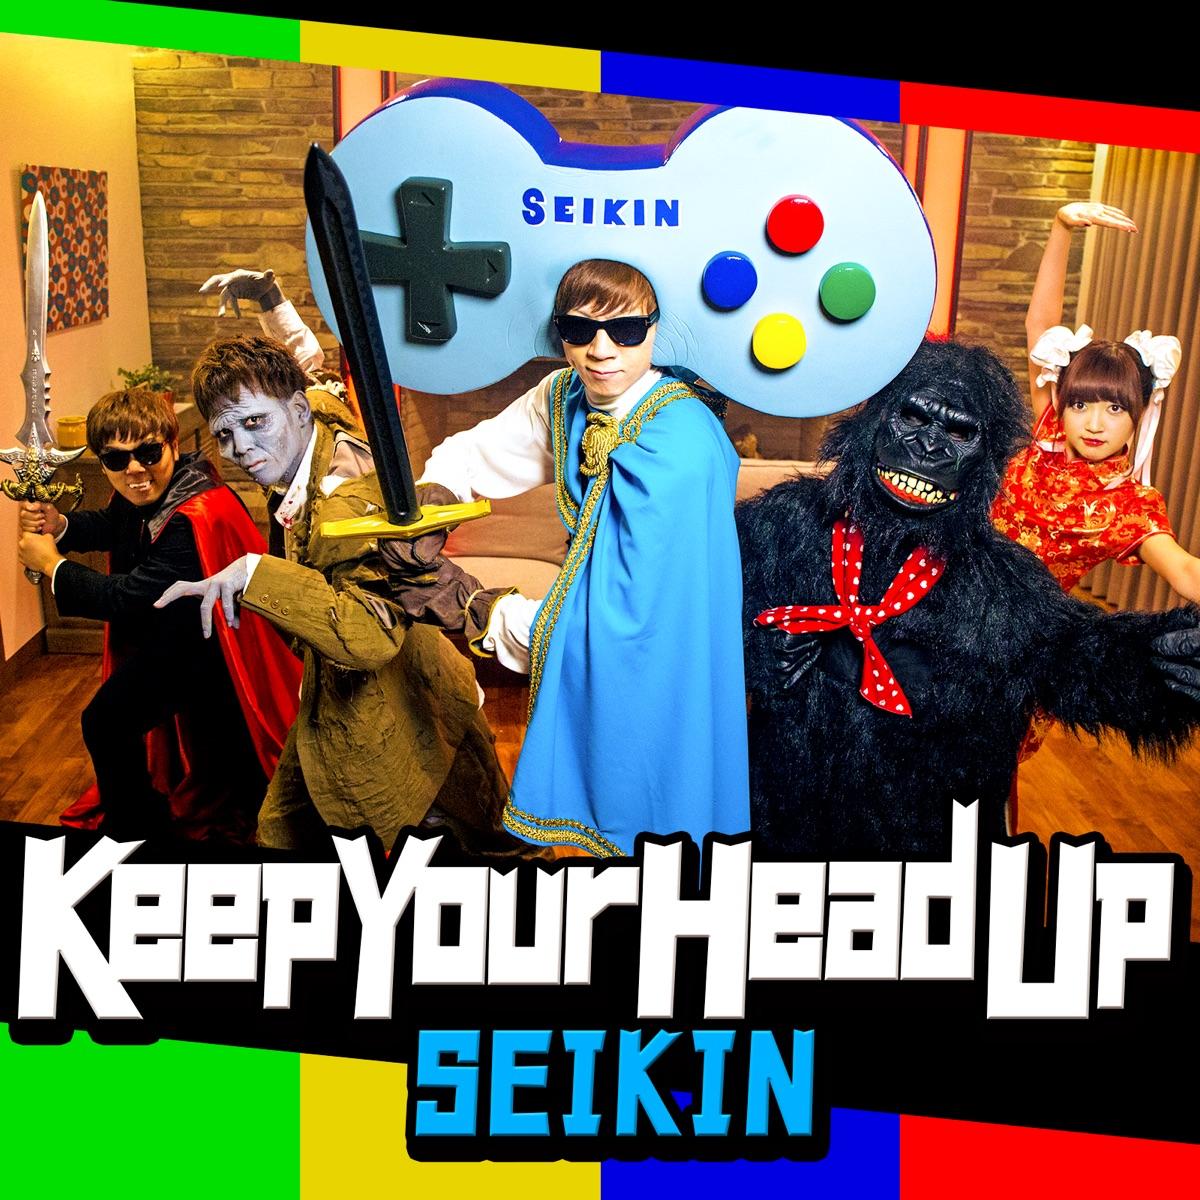 『SEIKIN - Keep Your Head Up』収録の『Keep Your Head Up』ジャケット